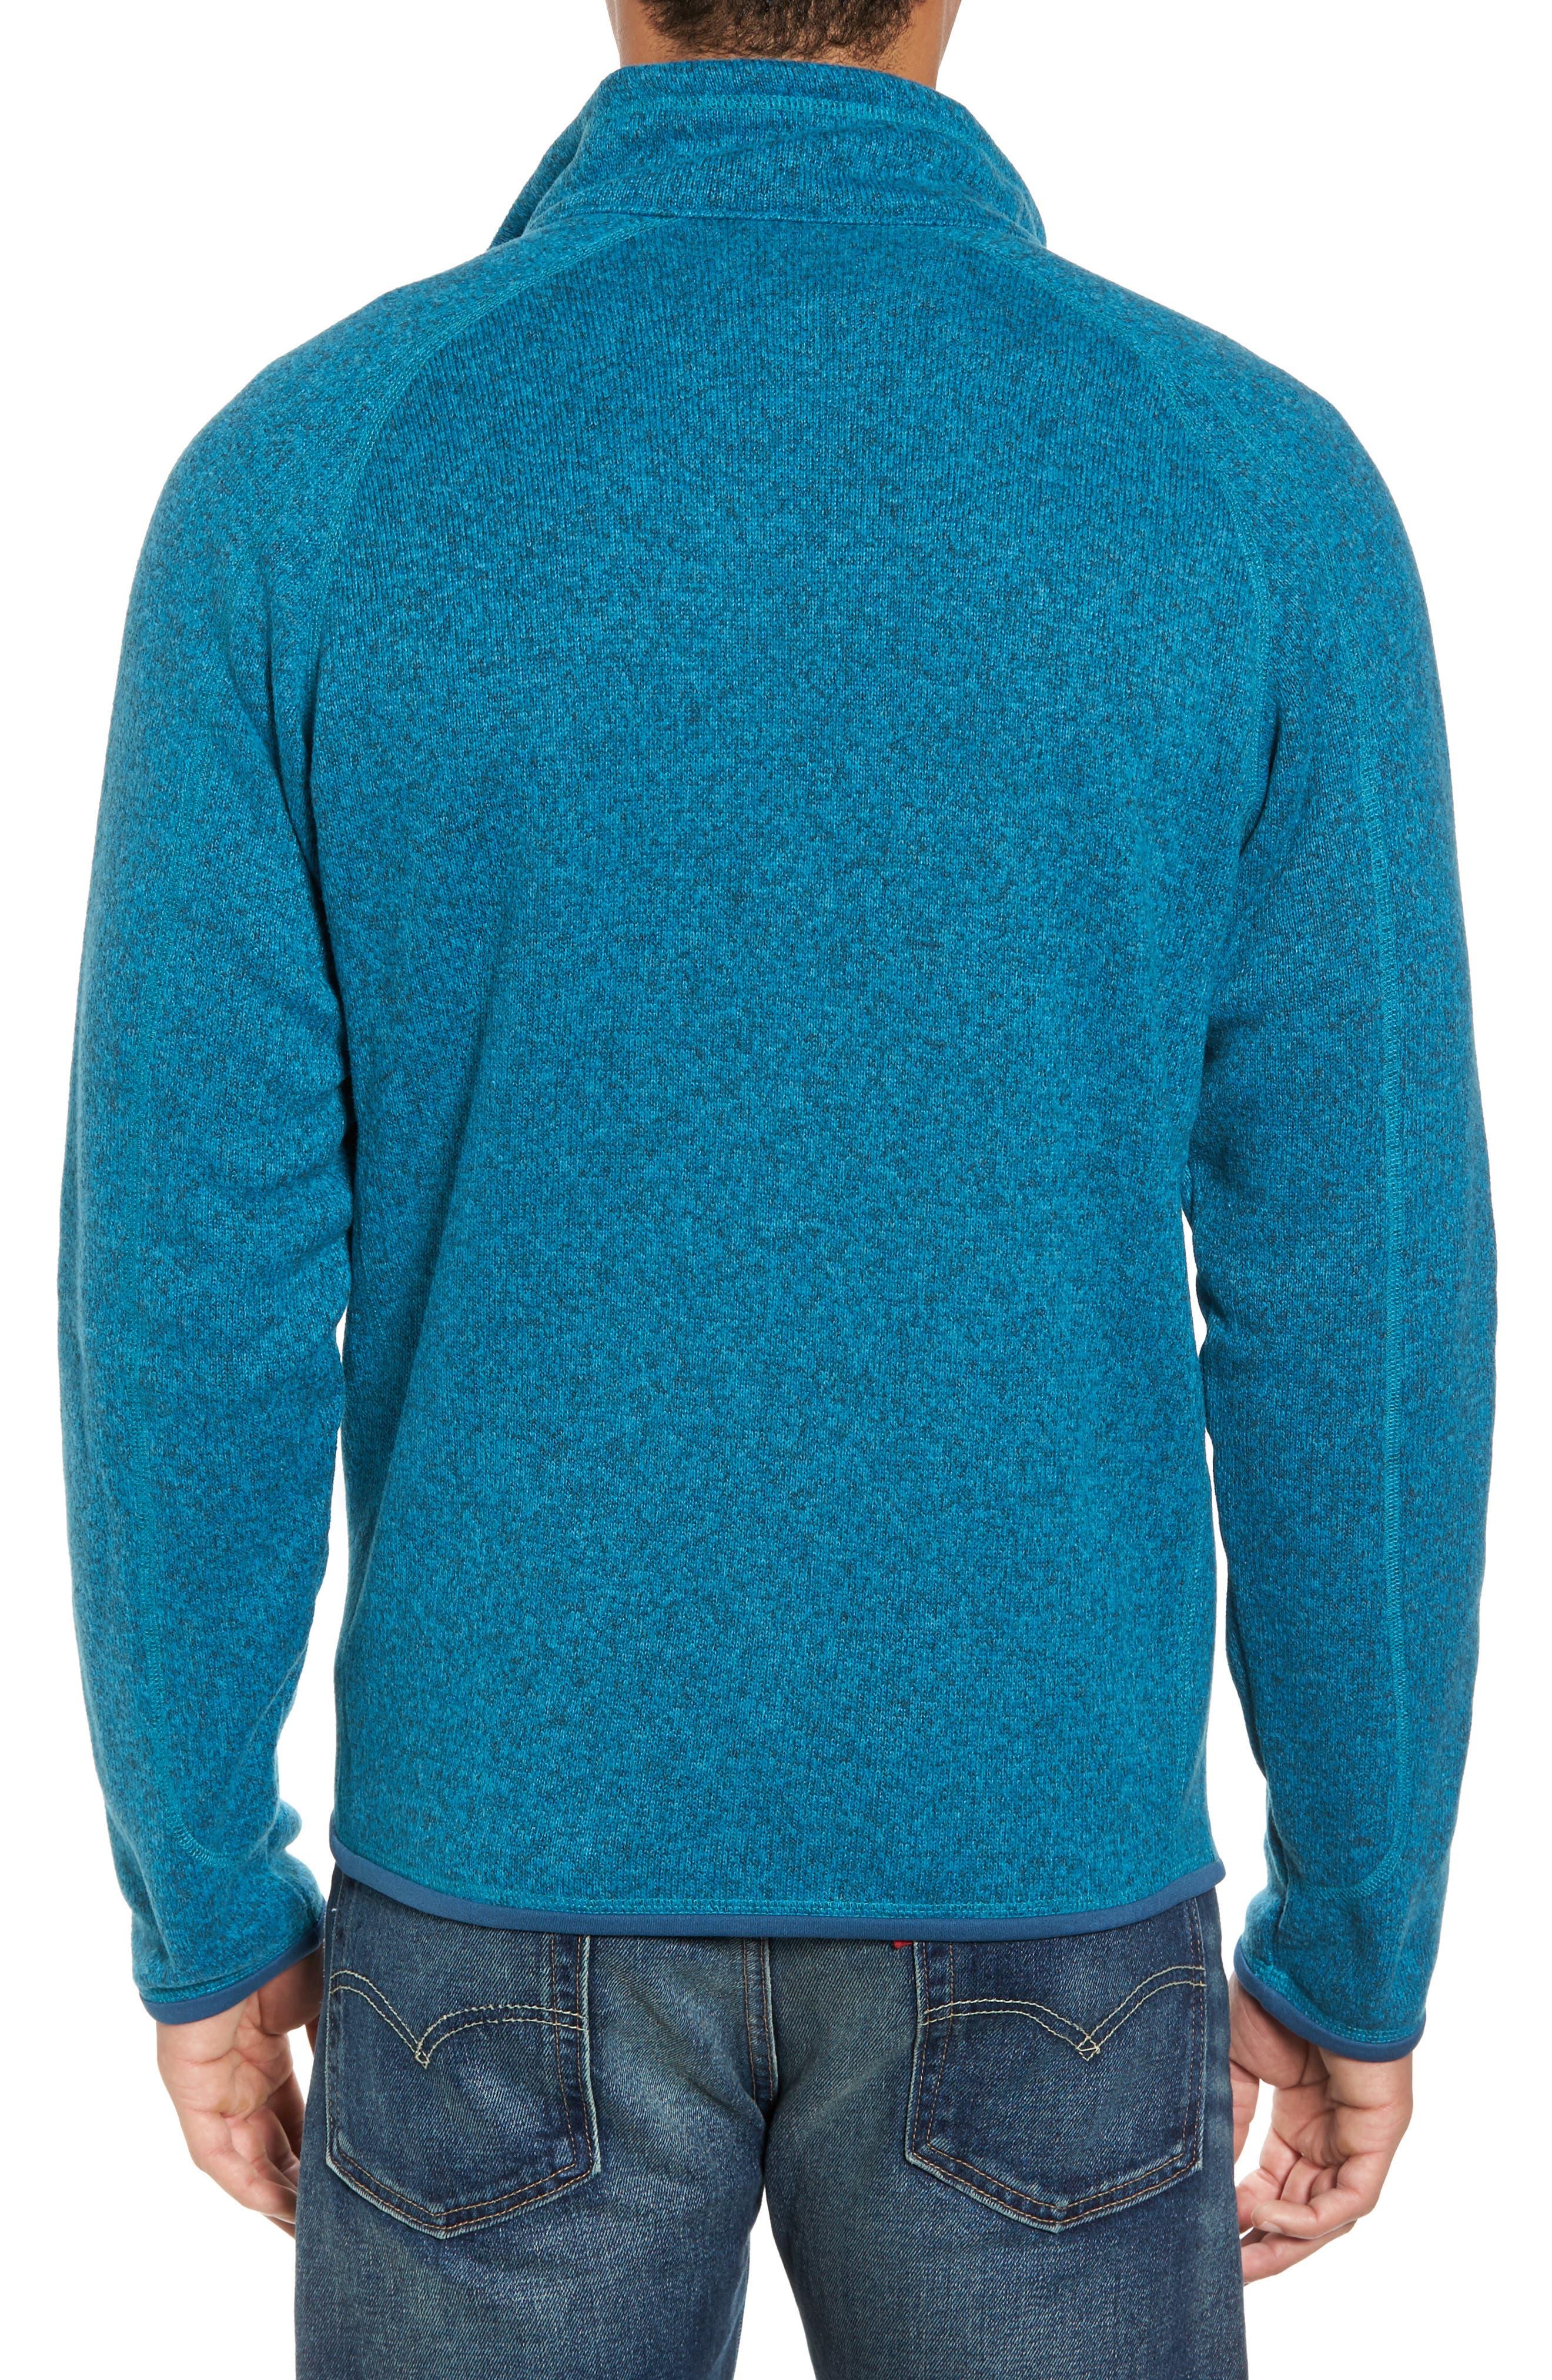 Better Sweater Zip Front Jacket,                             Alternate thumbnail 2, color,                             Filter Blue